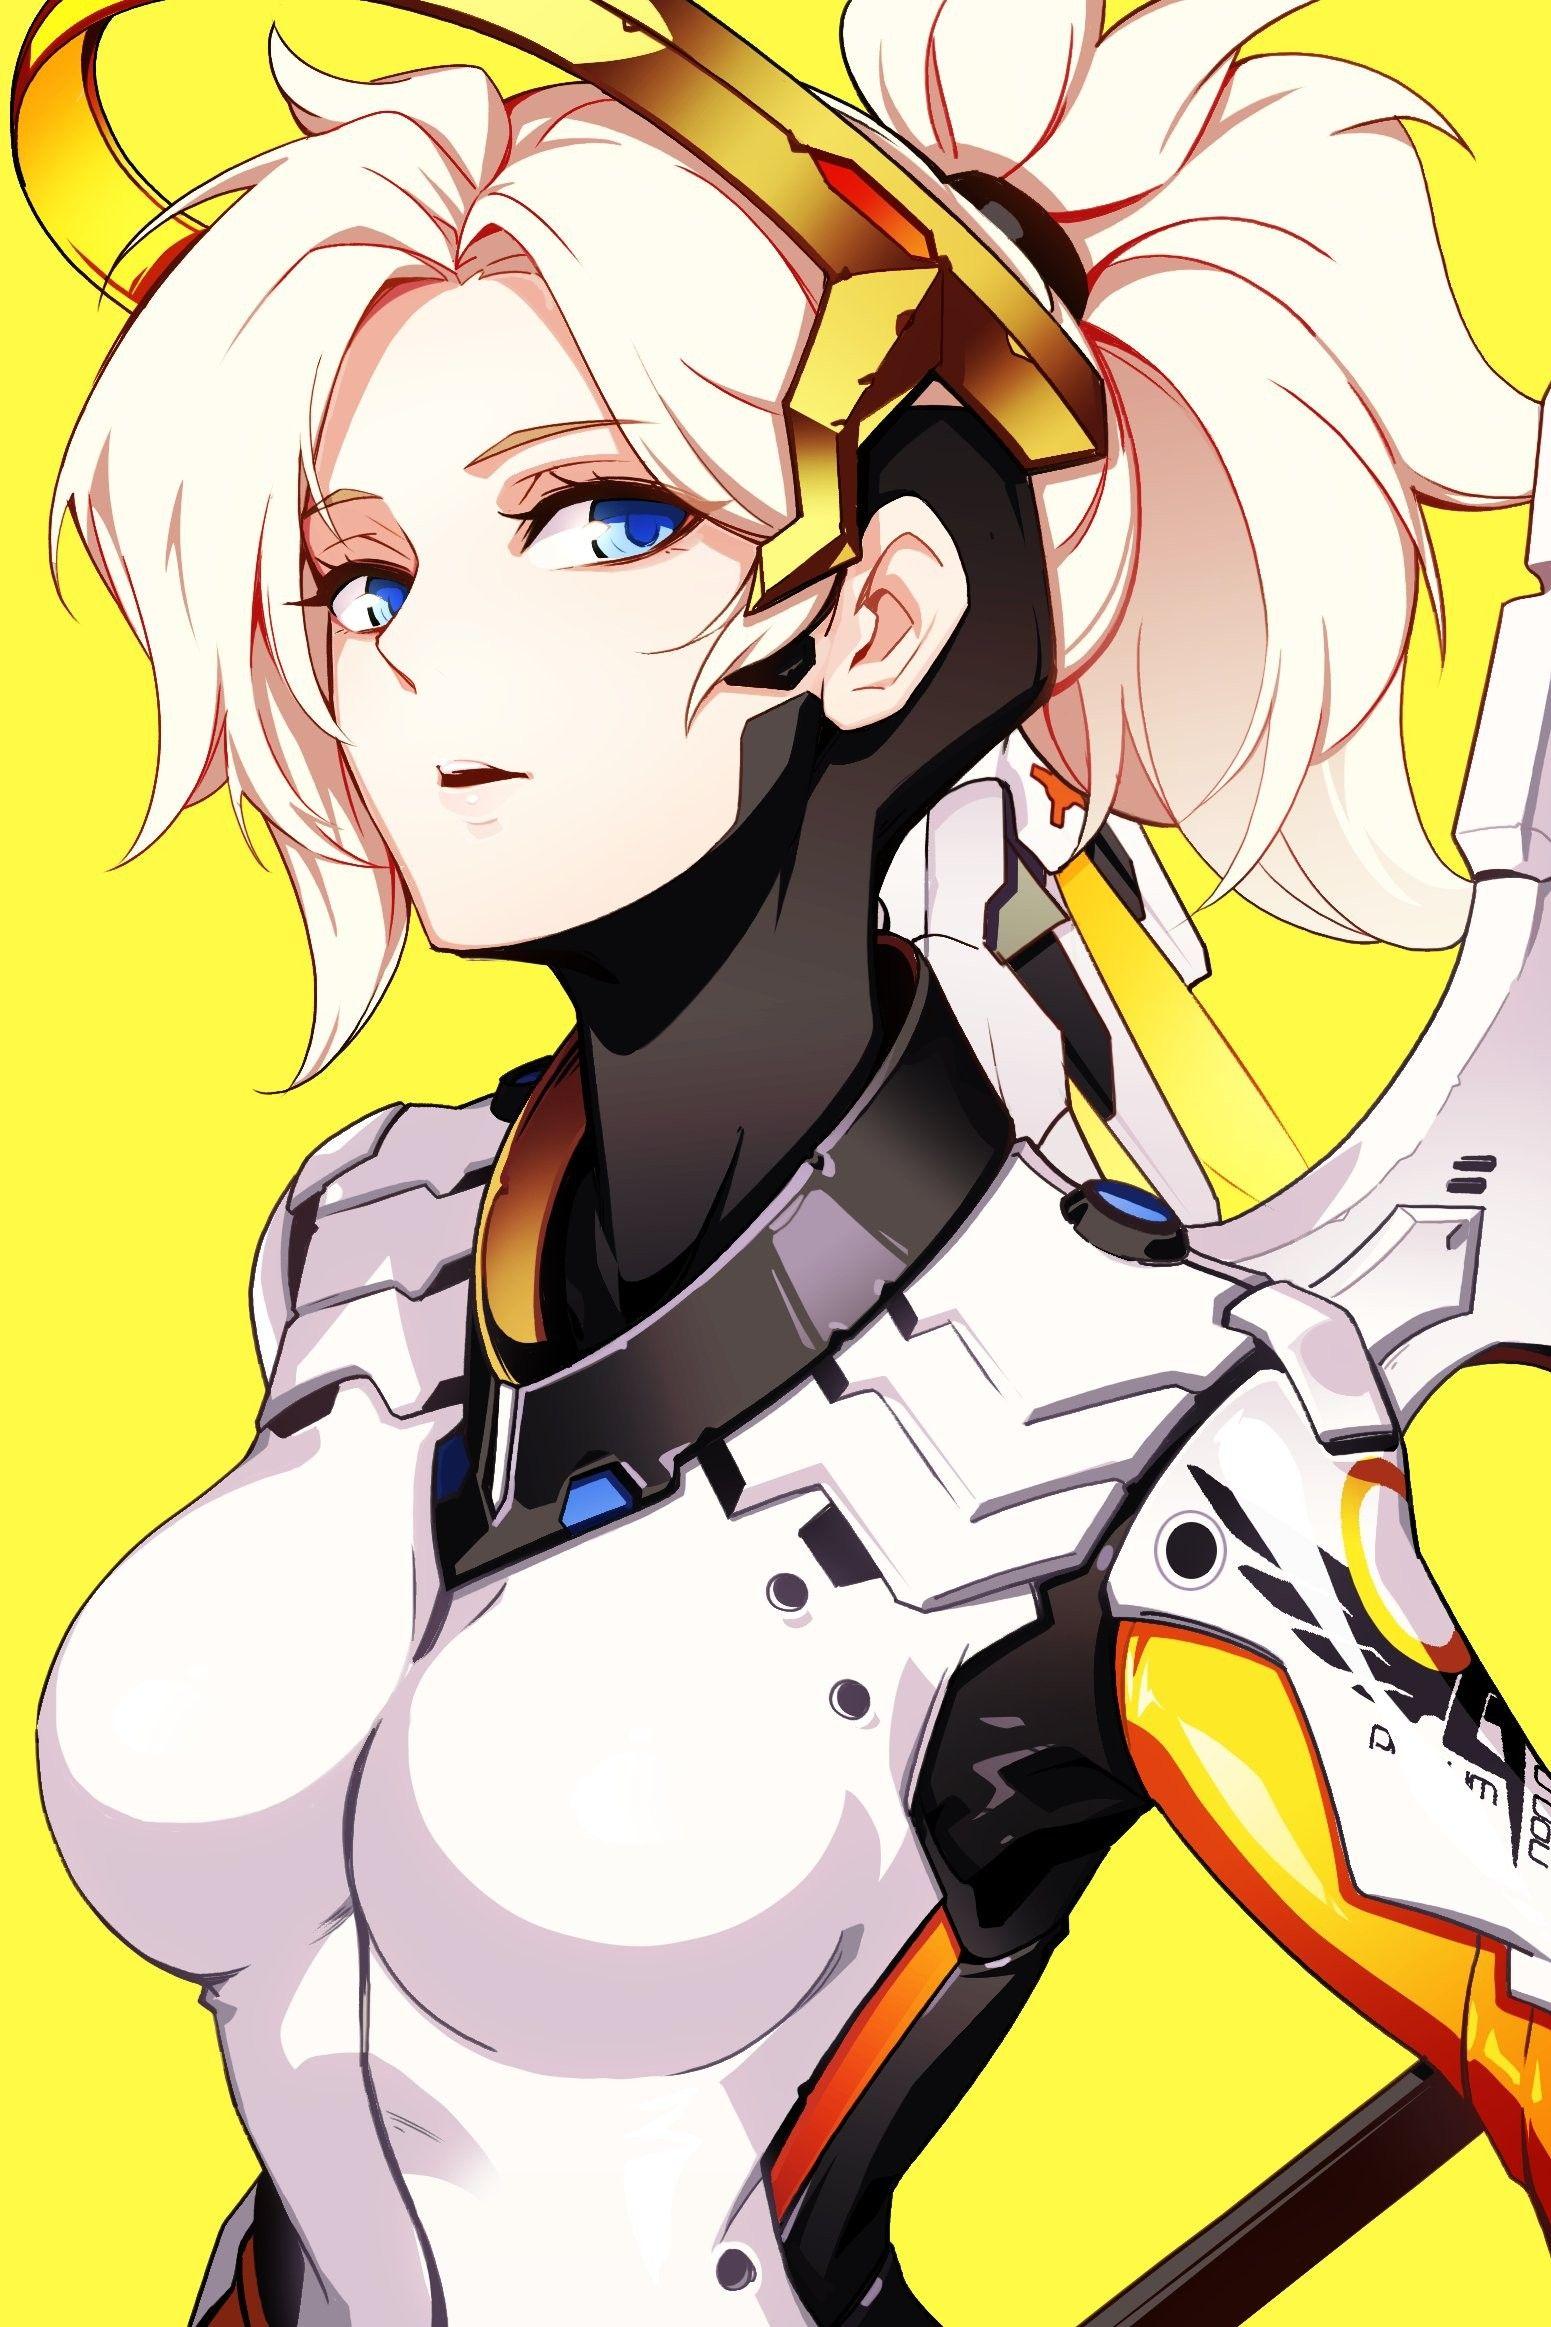 blue eyes, #anime, #anime girls, #Overwatch, #Mercy, #Mercy